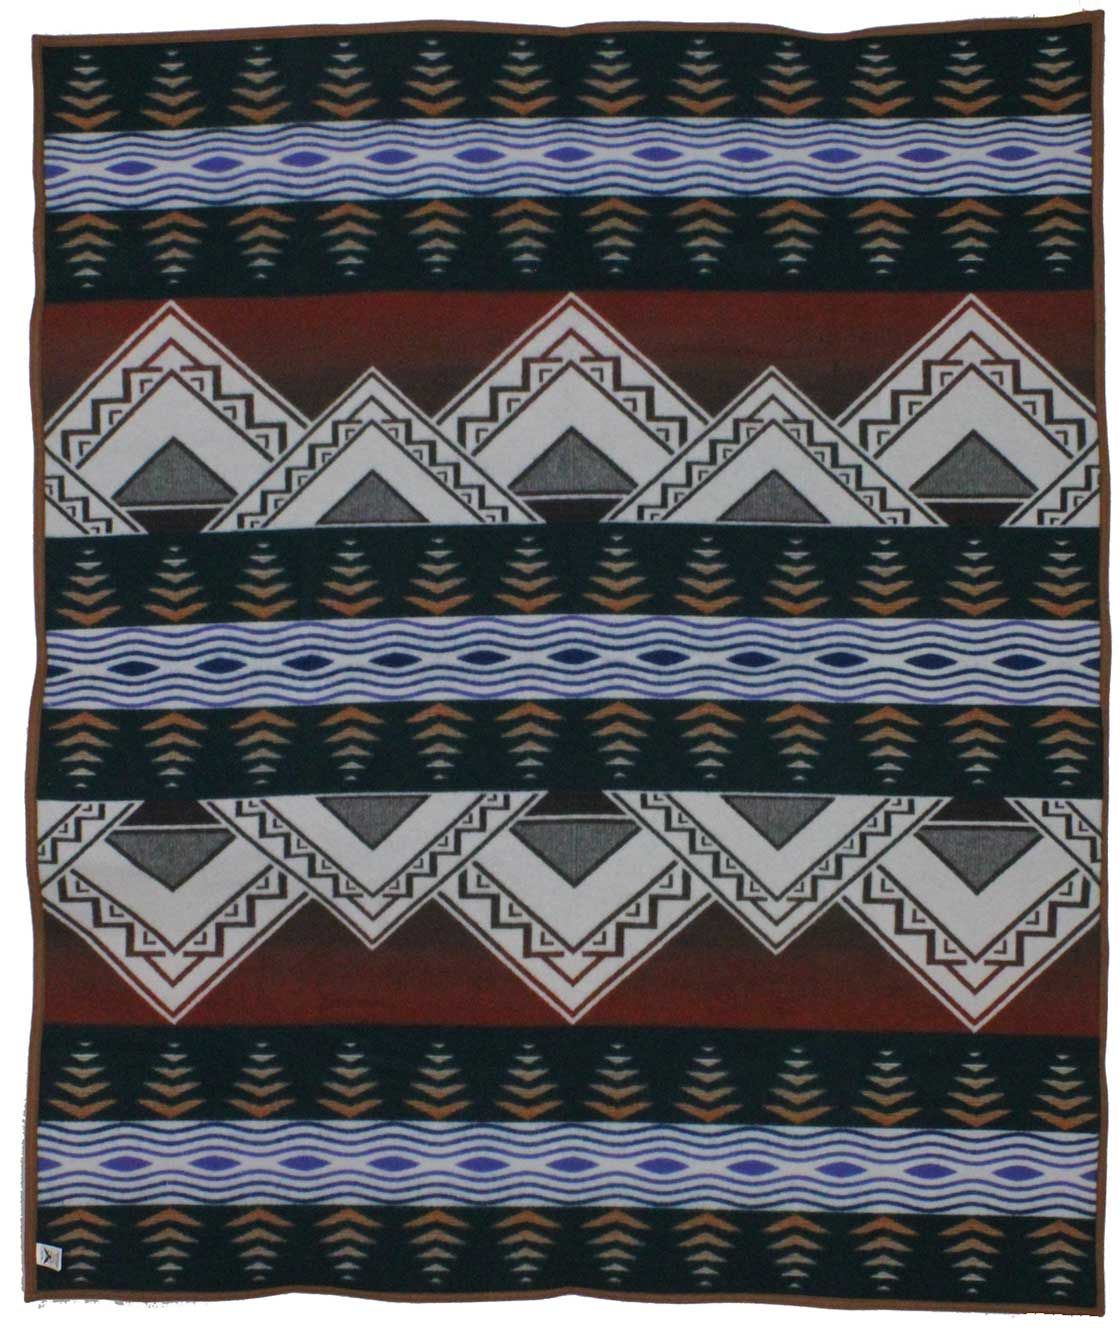 Pendleton American Treasures Blanket Napped Blanket Pendleton Blanket Pendleton